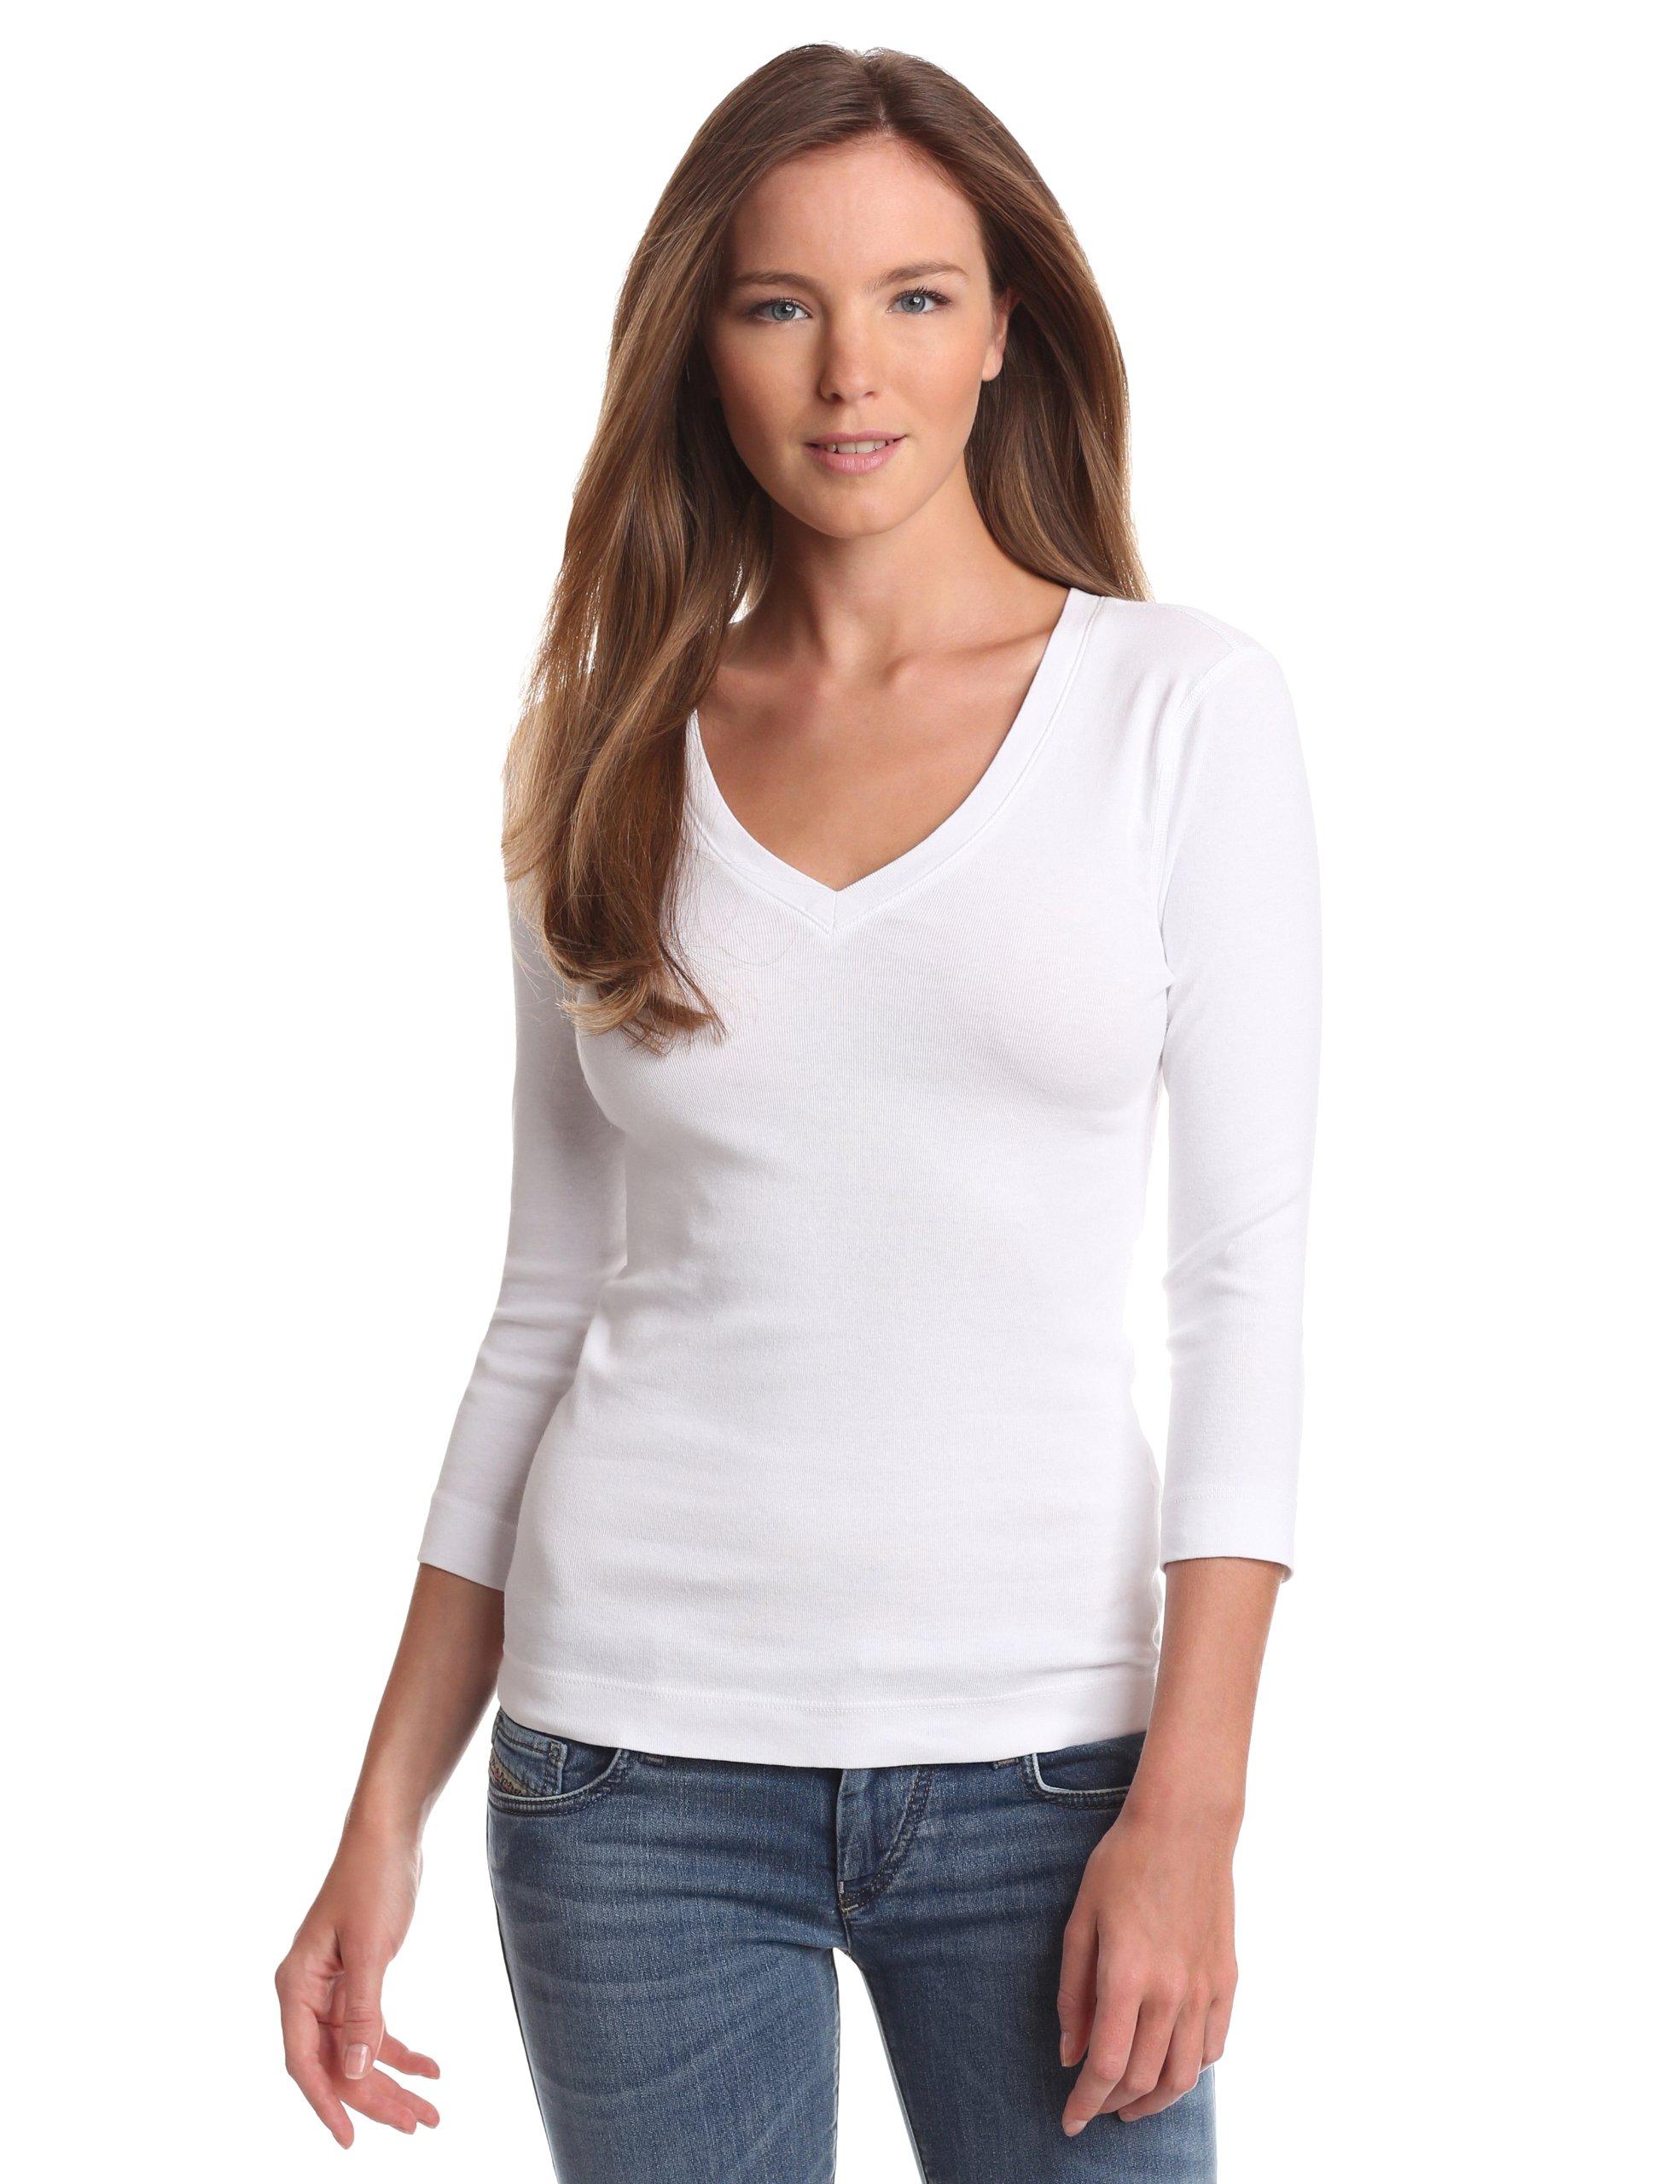 Three Dots Women's Deep V Neck 3/4 Sleeve Tee, White, Large